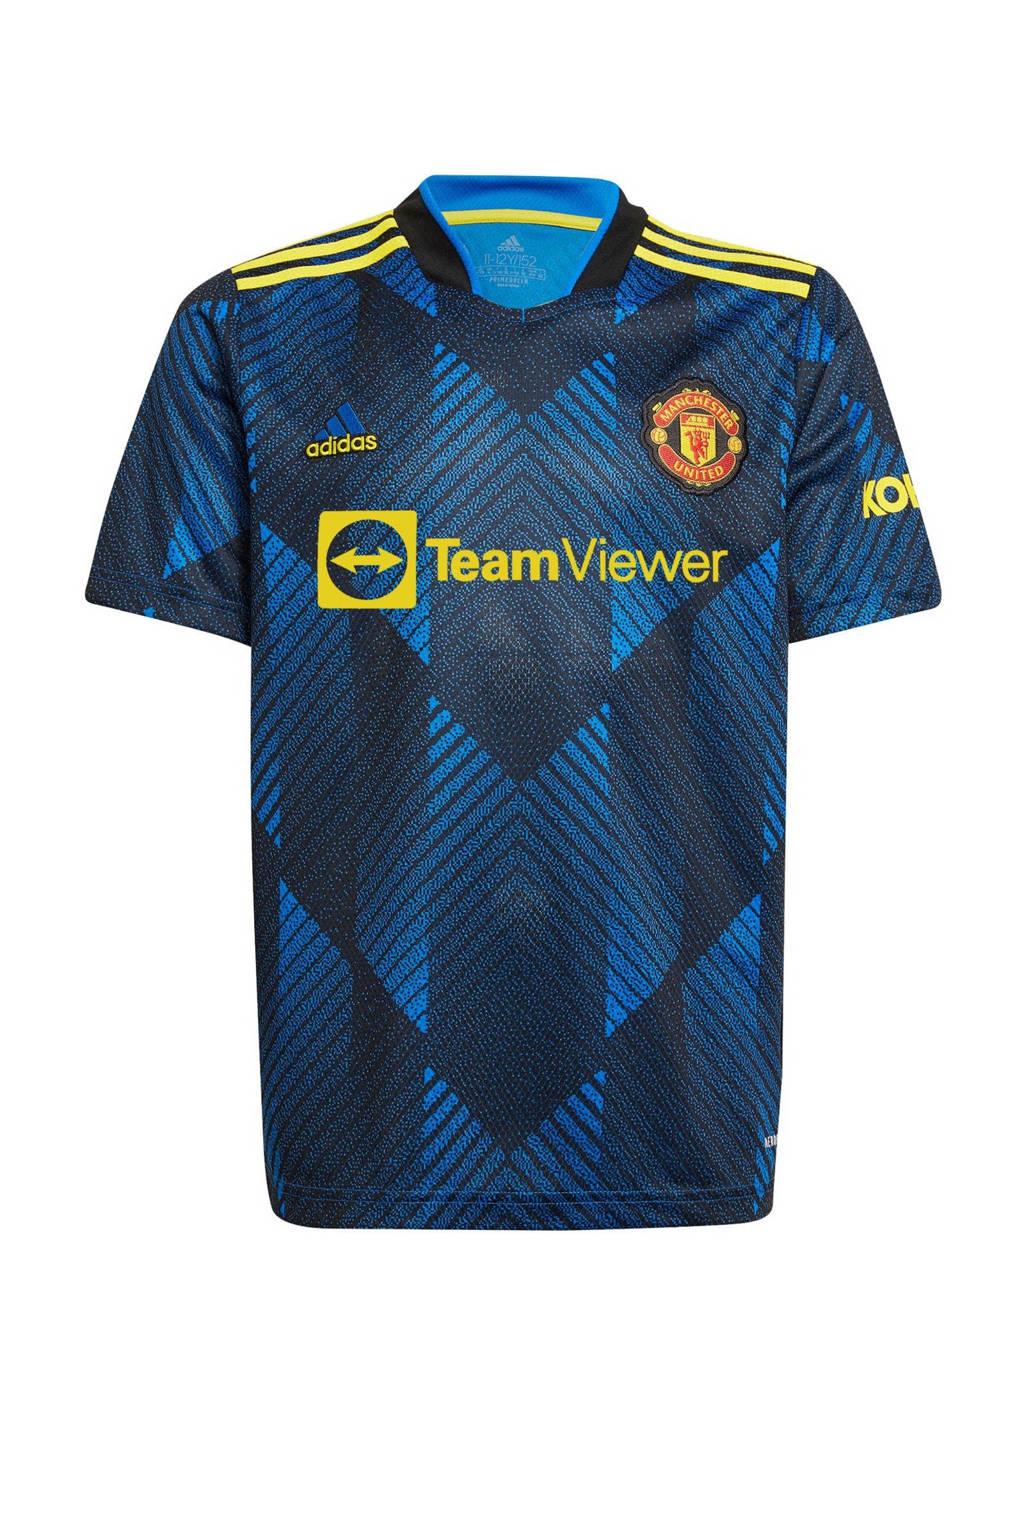 adidas Performance Junior Manchester United voetbalshirt, Blauw